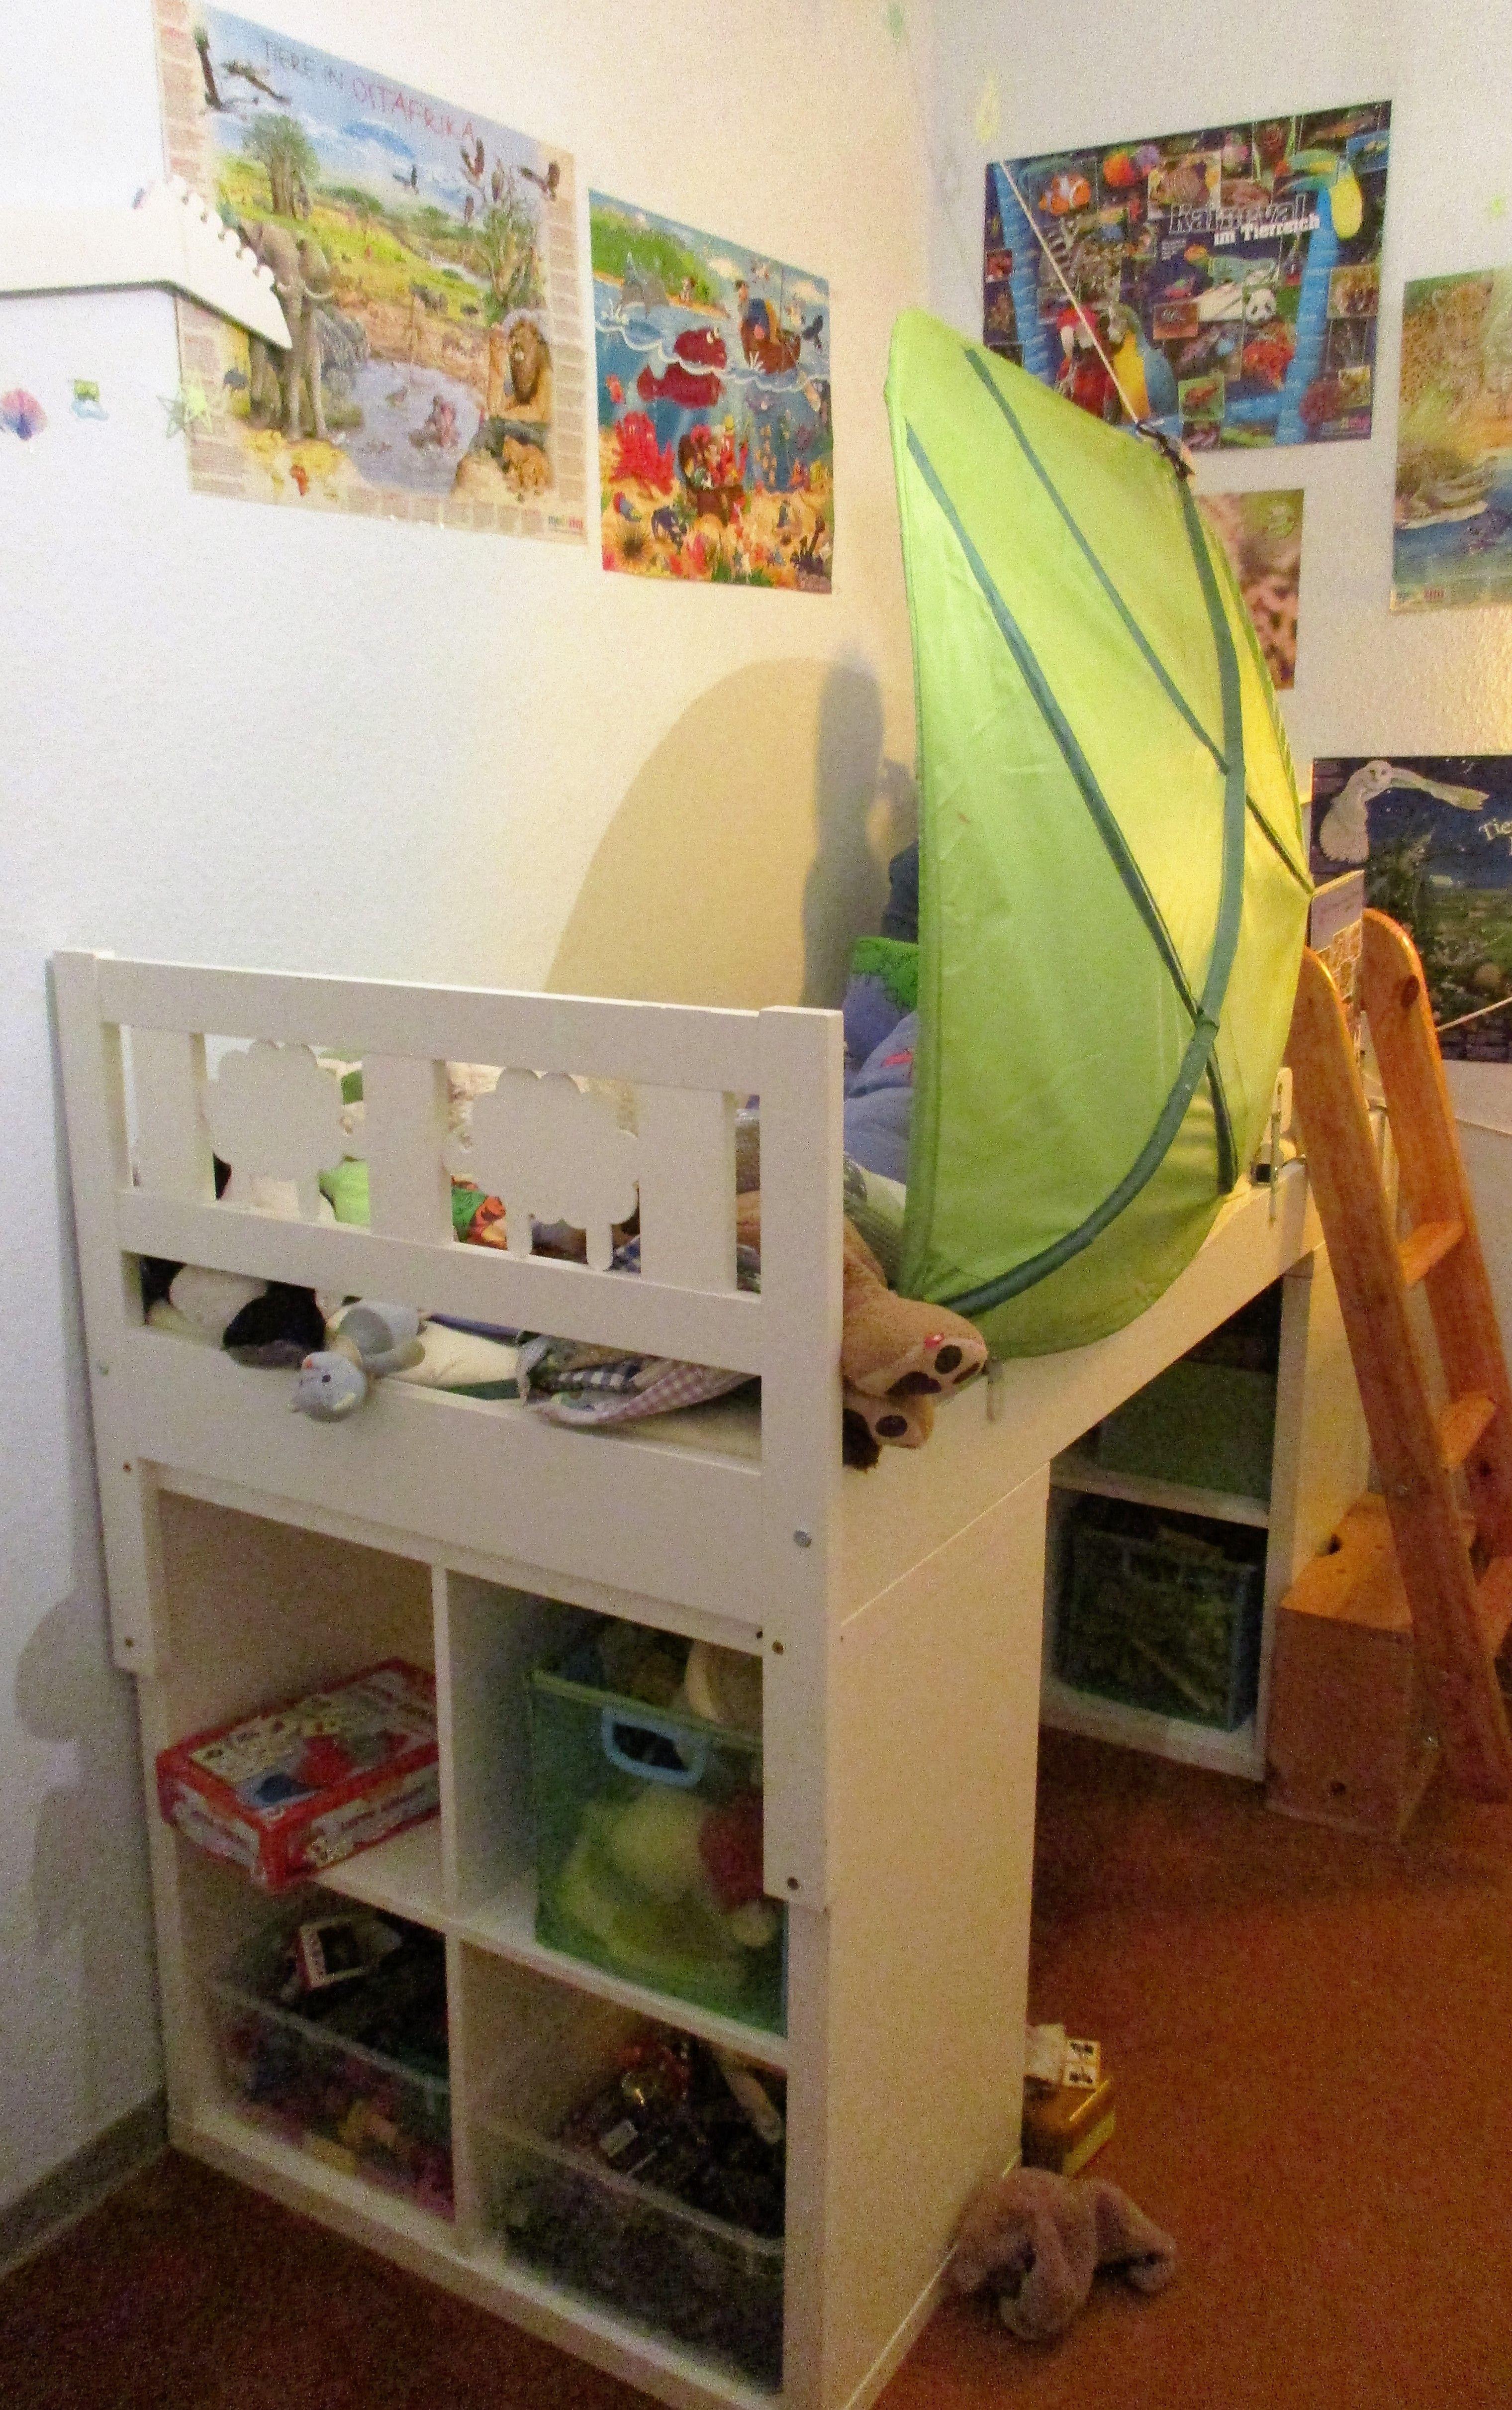 Kinderhochbett selber bauen  Hochbett selber bauen. 2x Kallax Regal von Ikea unter das Bett ...